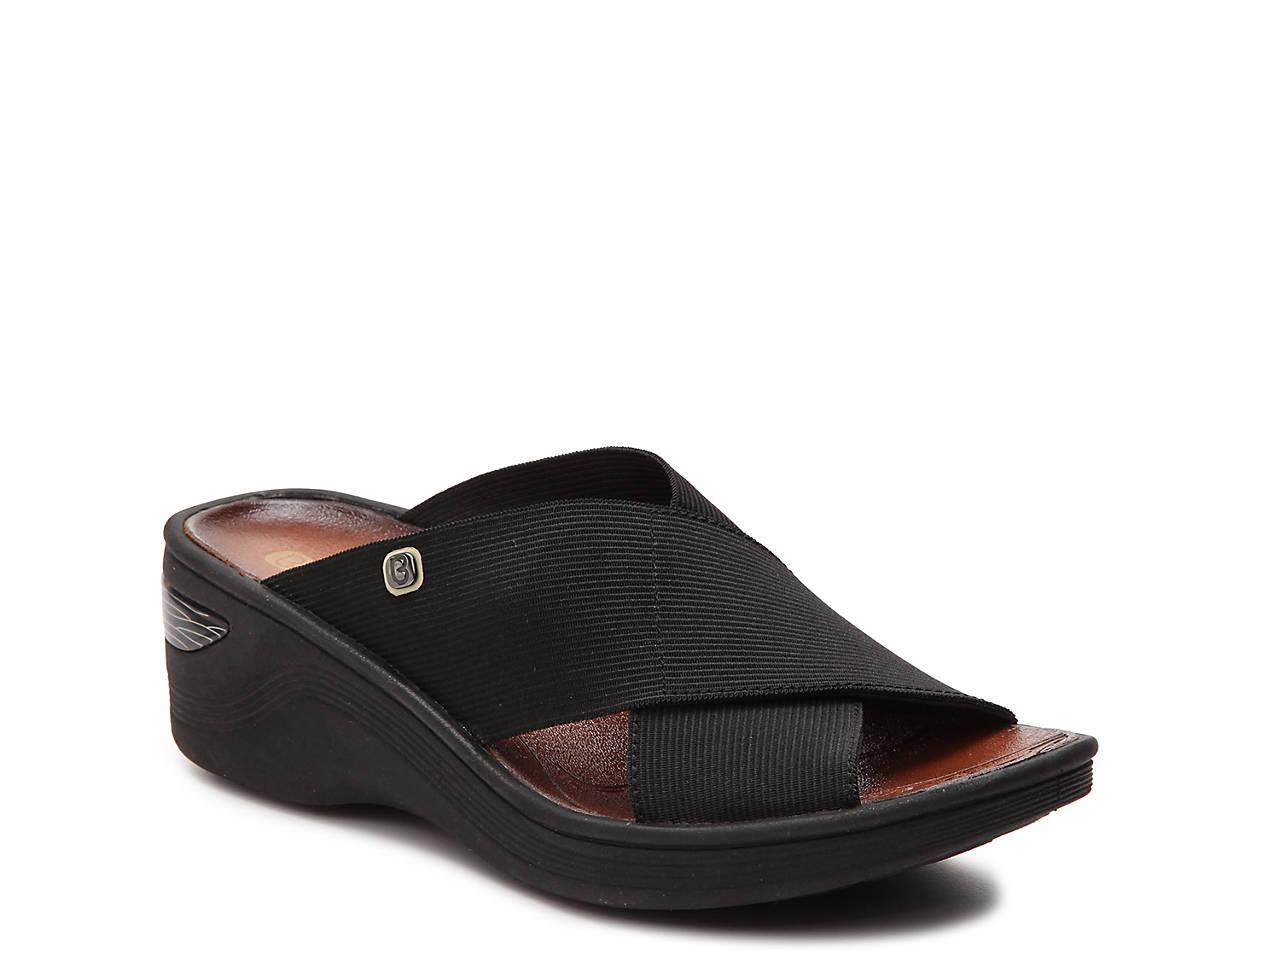 Desire Wedge Sandal